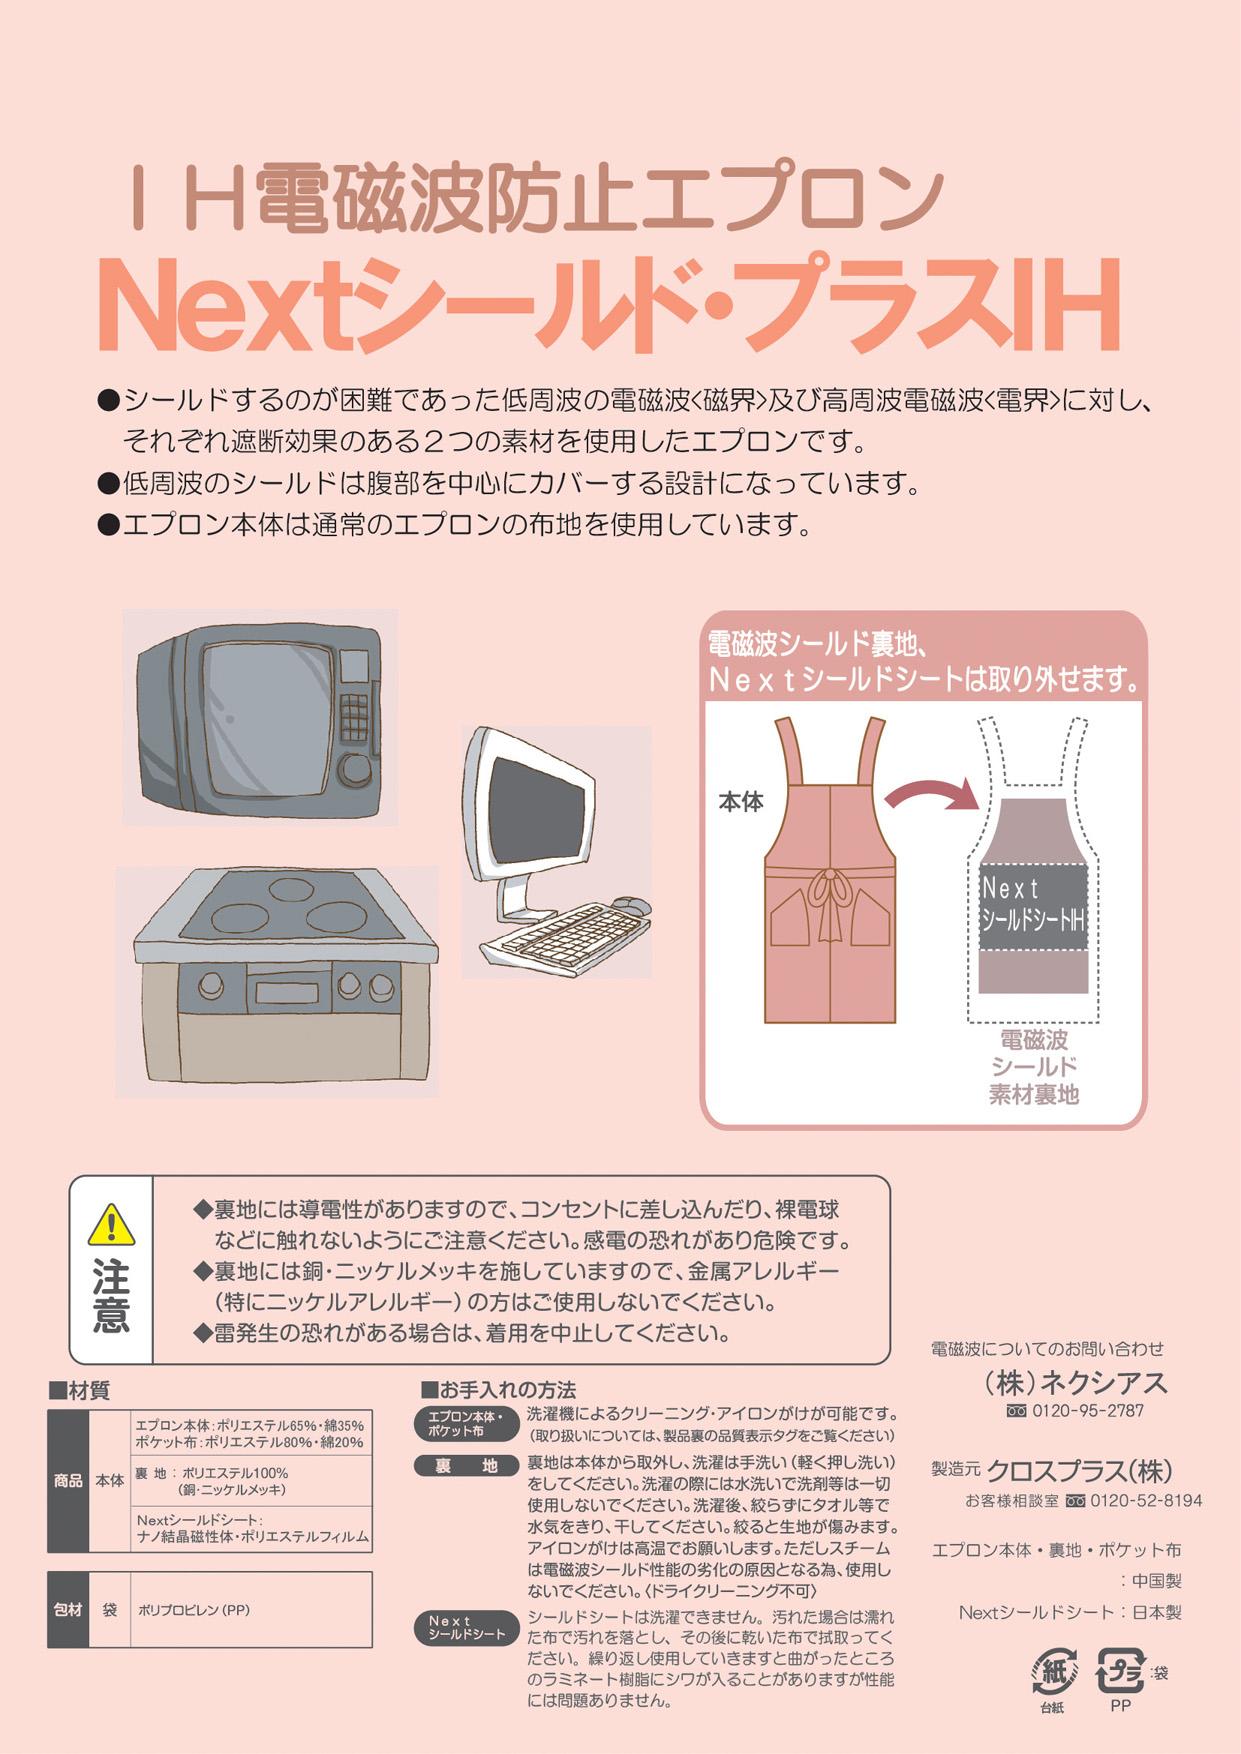 IH電磁波防止エプロン Nextシールド・プラス クロスプラス製